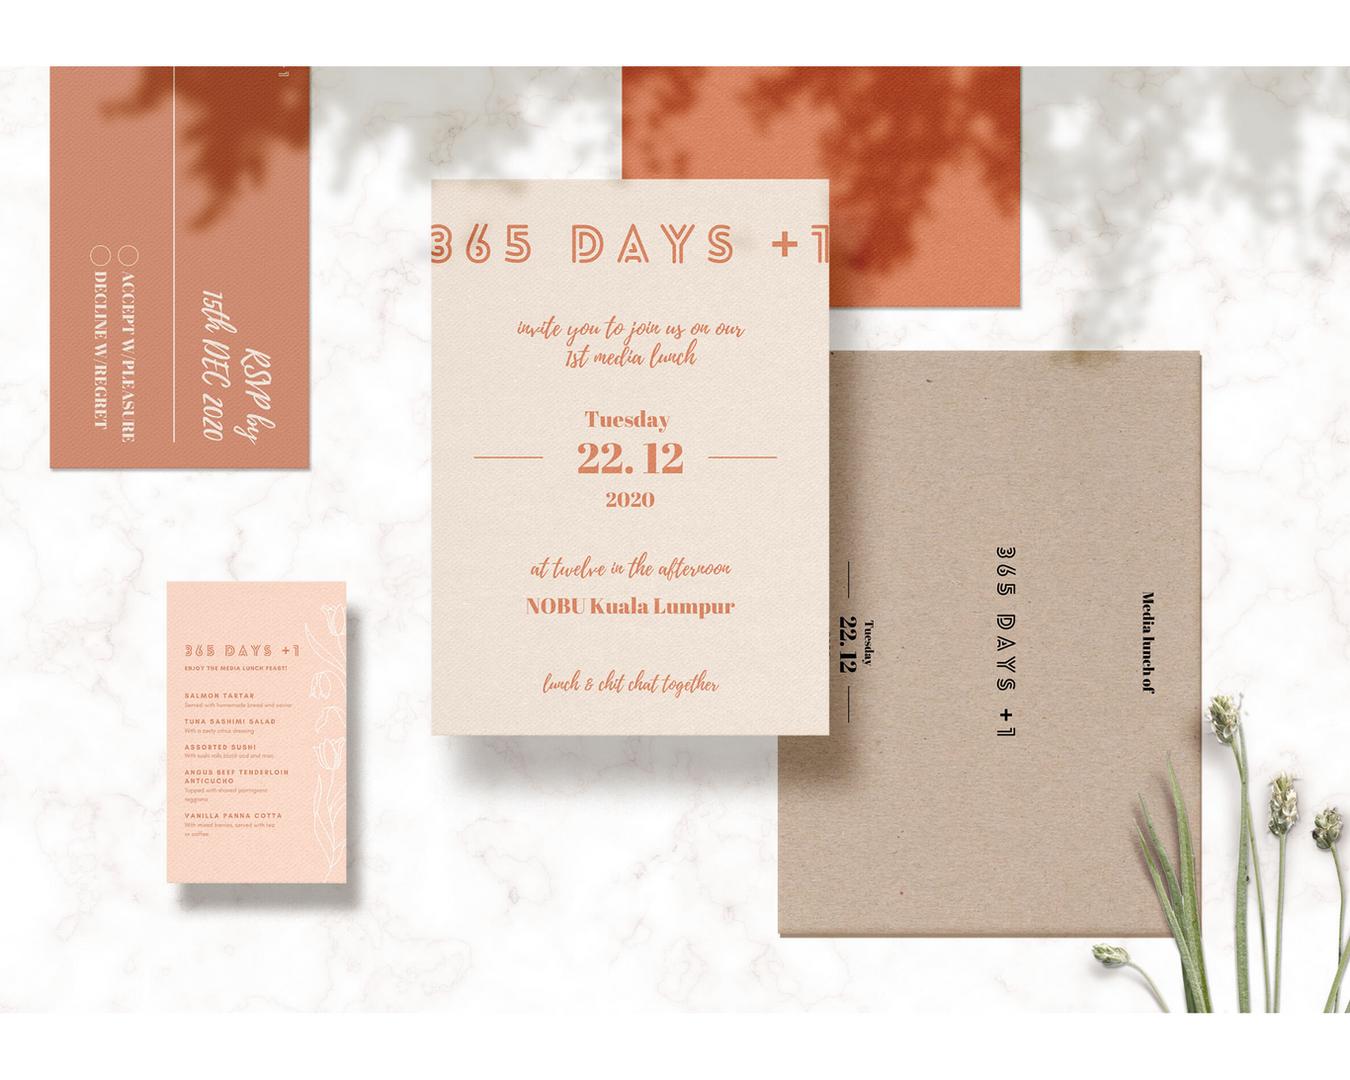 365+1 Days Press Pack